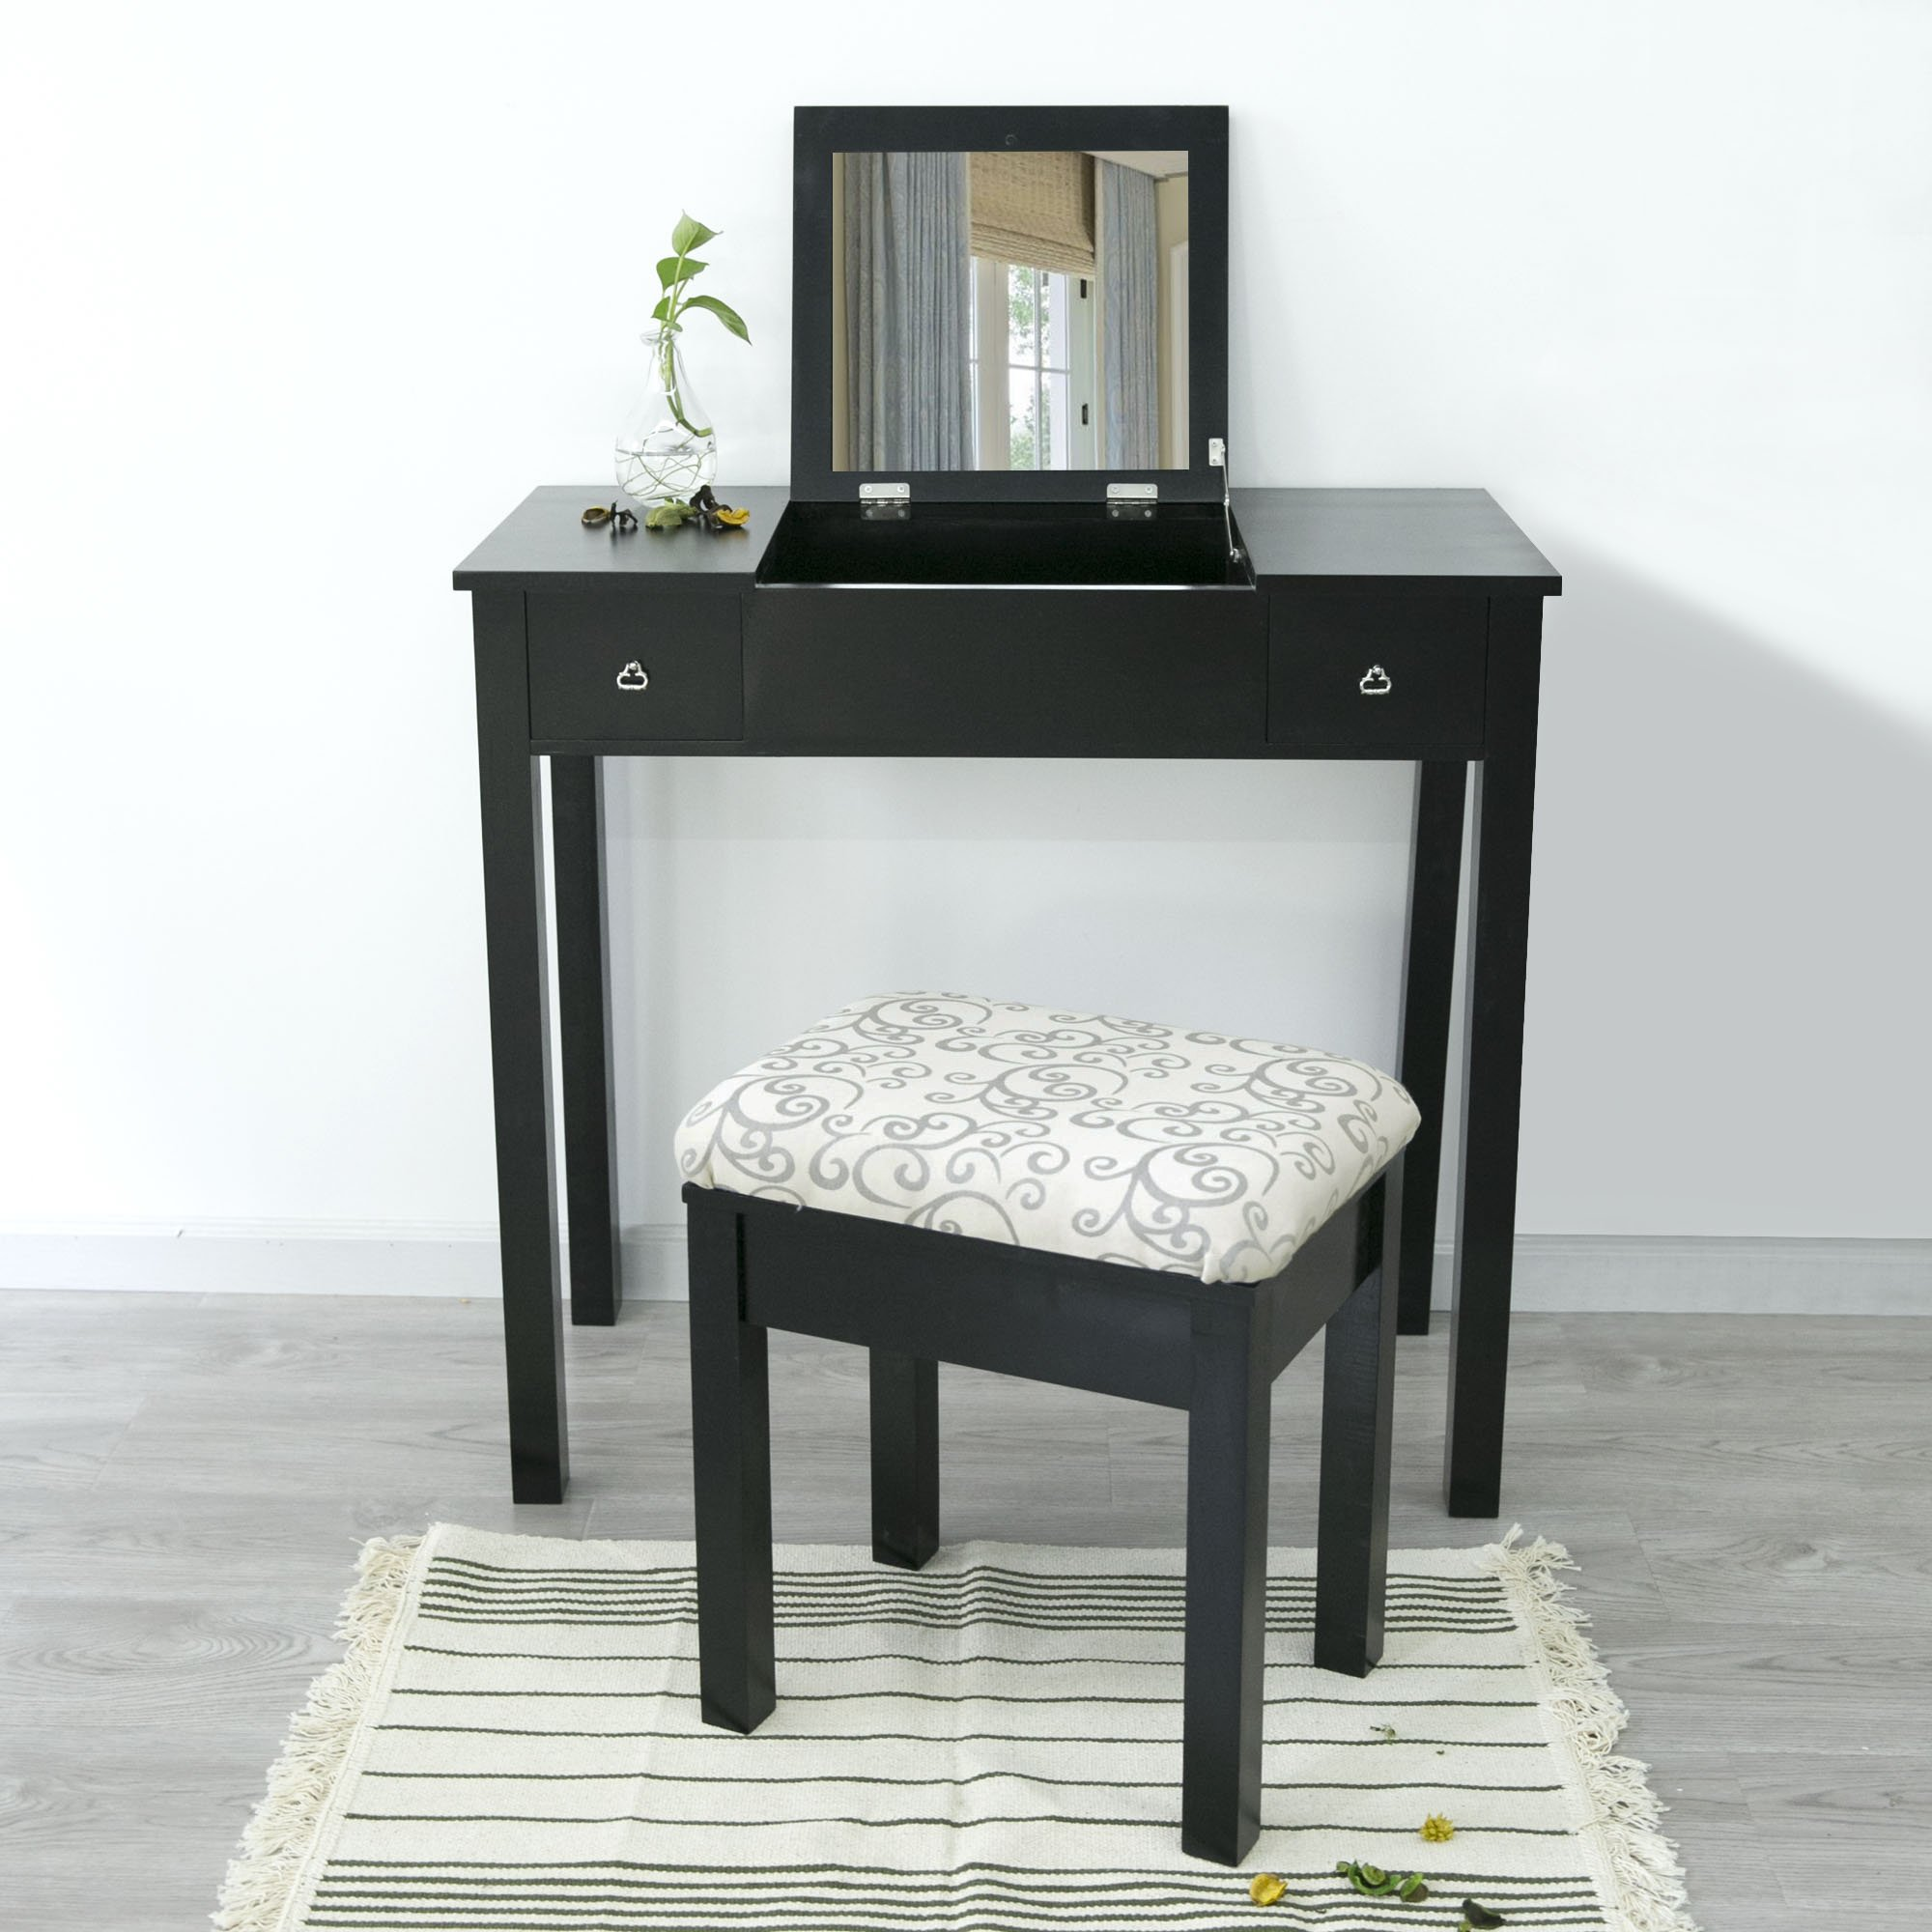 Cloud Mountain Vanity Table Set Makeup Jewelry Flip-top Mirrored Dressing Table Stool Set, Black